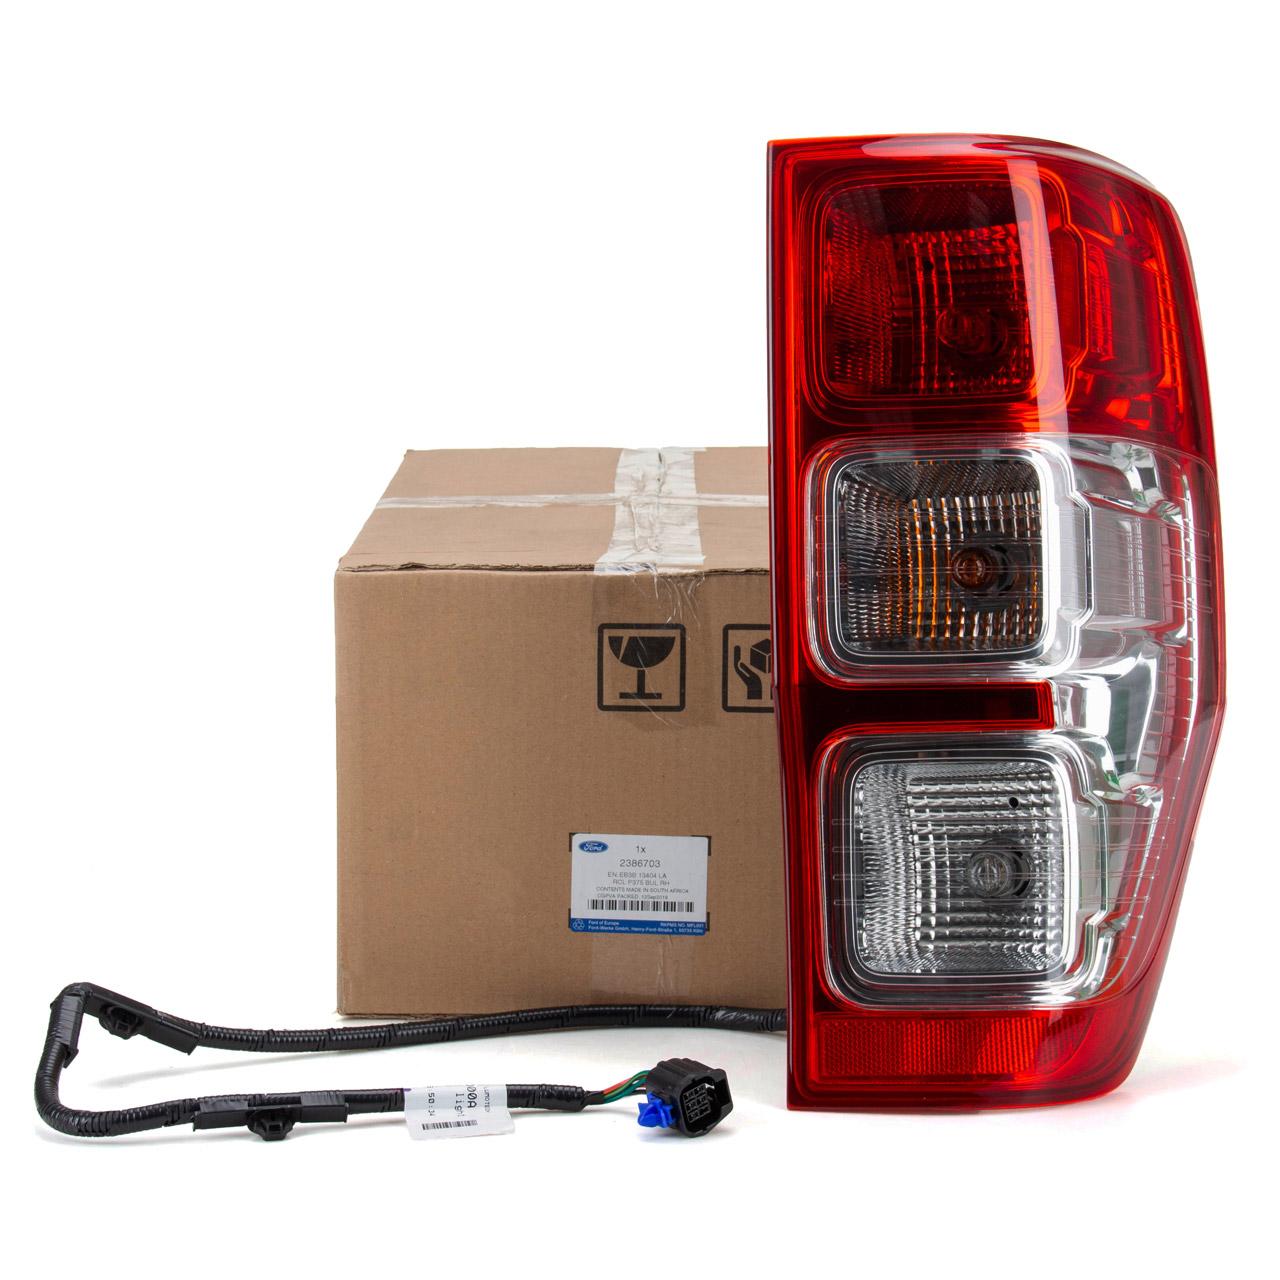 ORIGINAL Ford Heckleuchte Rückleuchte Rücklicht RANGER (TKE) rechts 2386703